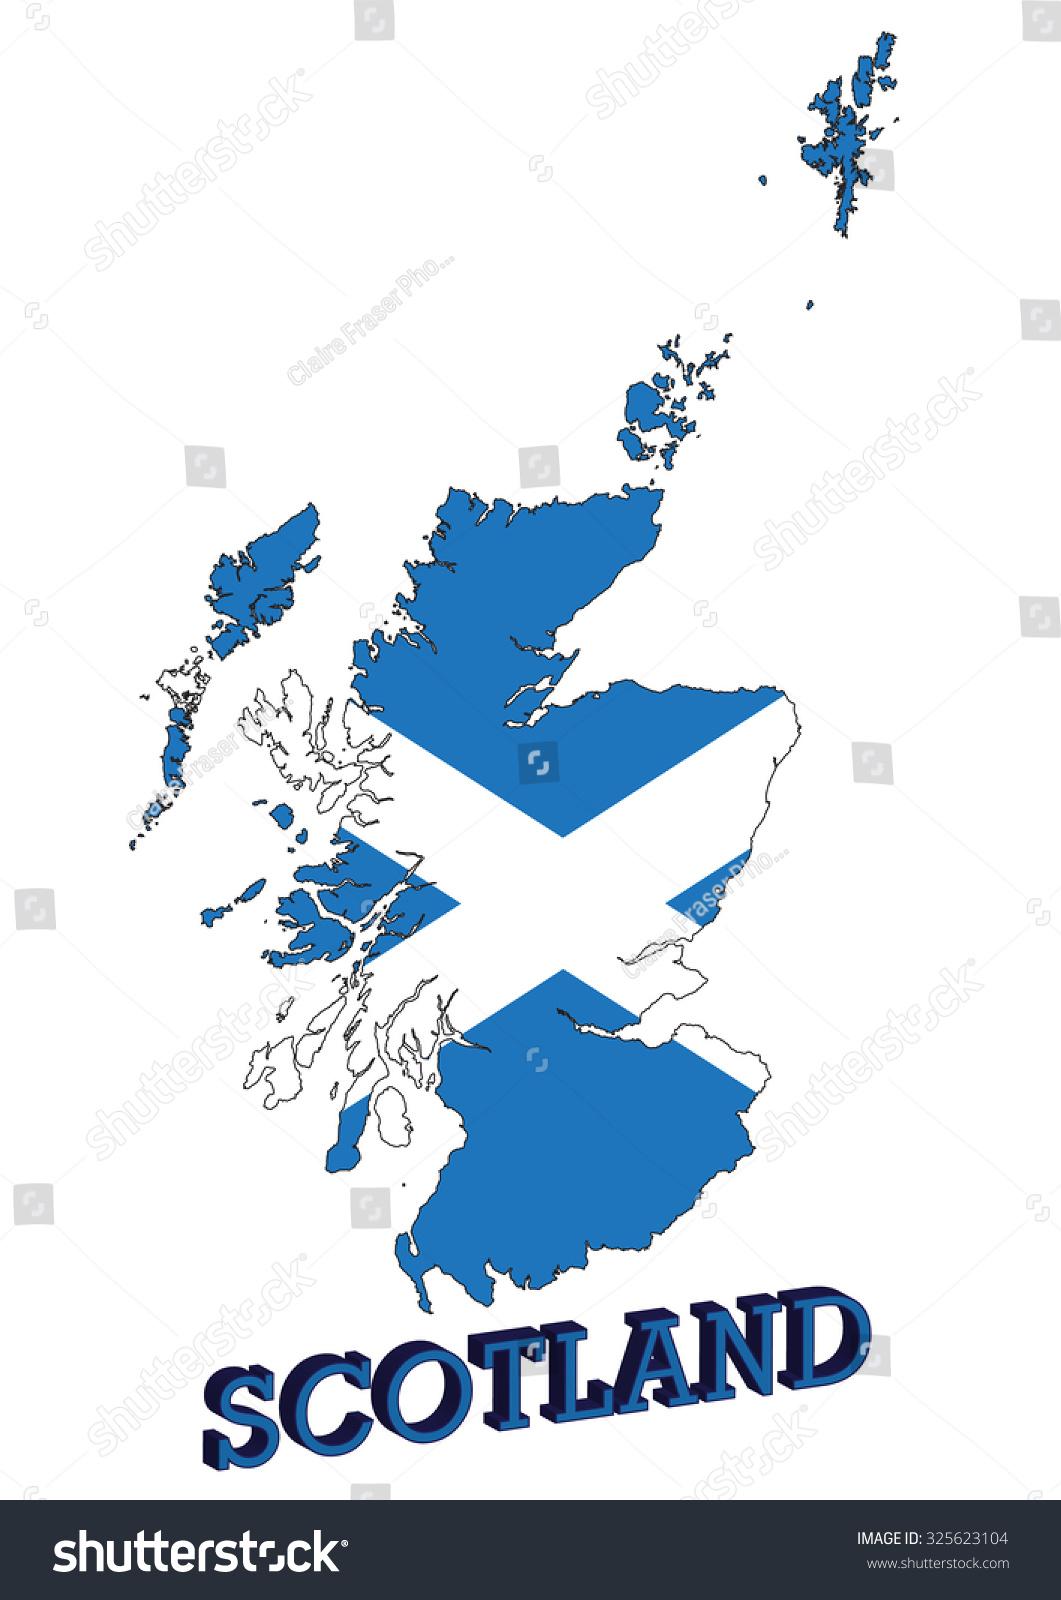 Map Scotland Uk St Andrews Cross Stock Vector (Royalty Free ... on scotland x france, scotland map outline, island of islay scotland map, scotland map google, scotland county map, scotland shortbread recipe, scotland beach, scotland name map, scotland community, scotland on map, scotland map large, scotland lion, scotland travel map, silhouette scotland map, scotland football map, scotland tattoo, scotland road map,